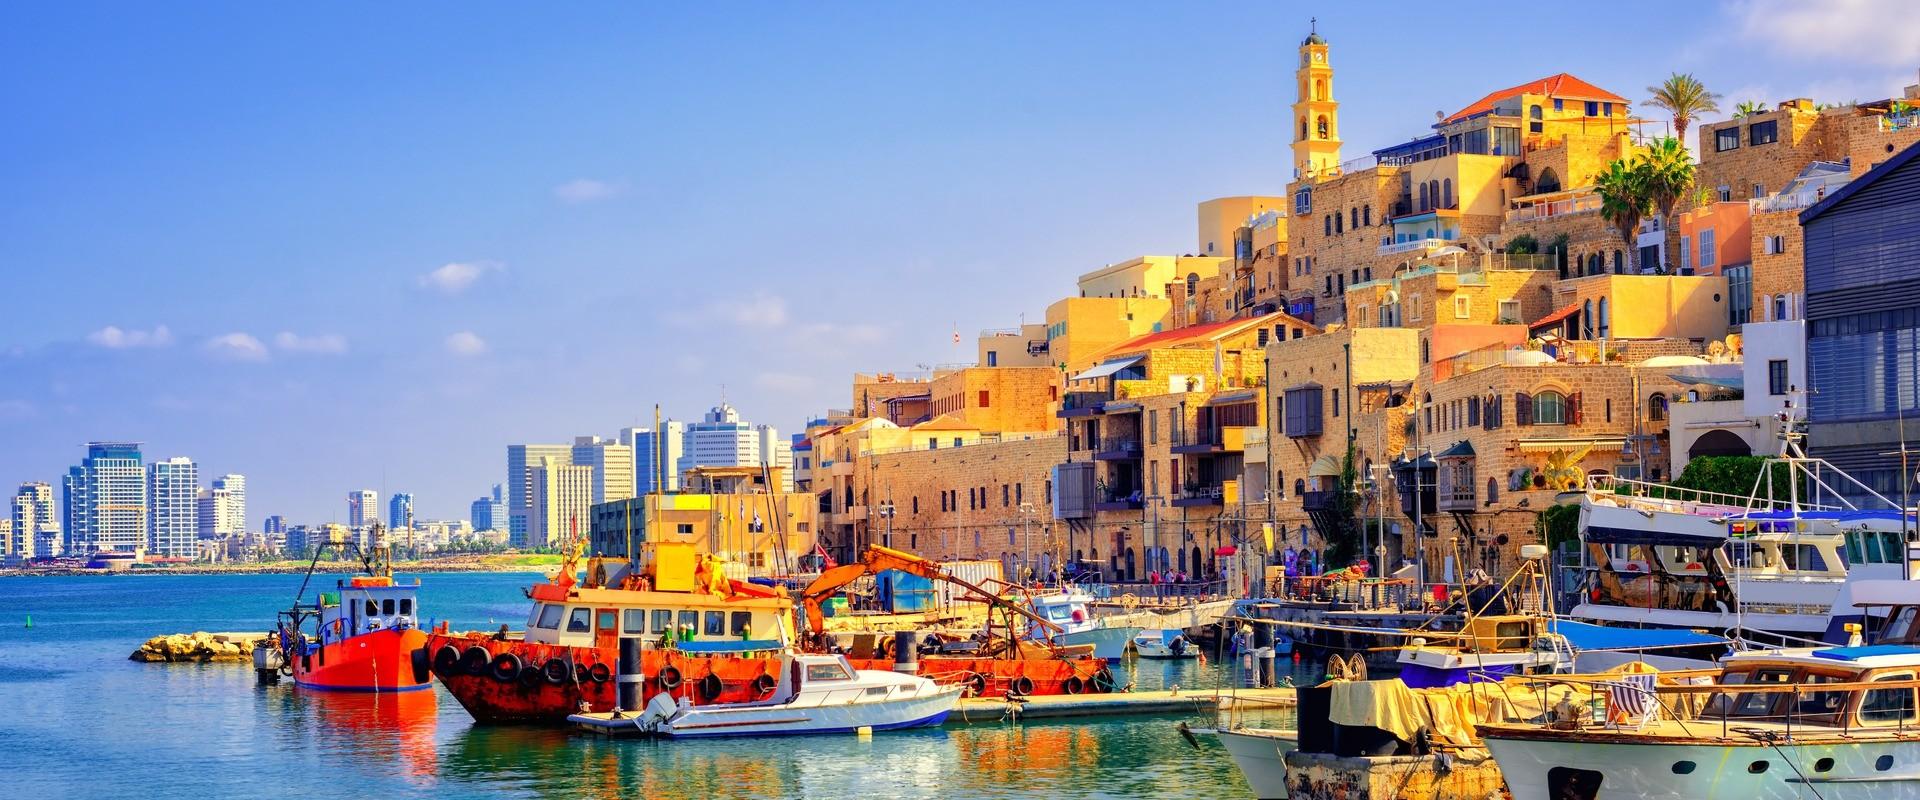 Christian tour in Jaffa | Christian tour Jaffa | Holy Land VIP Tours